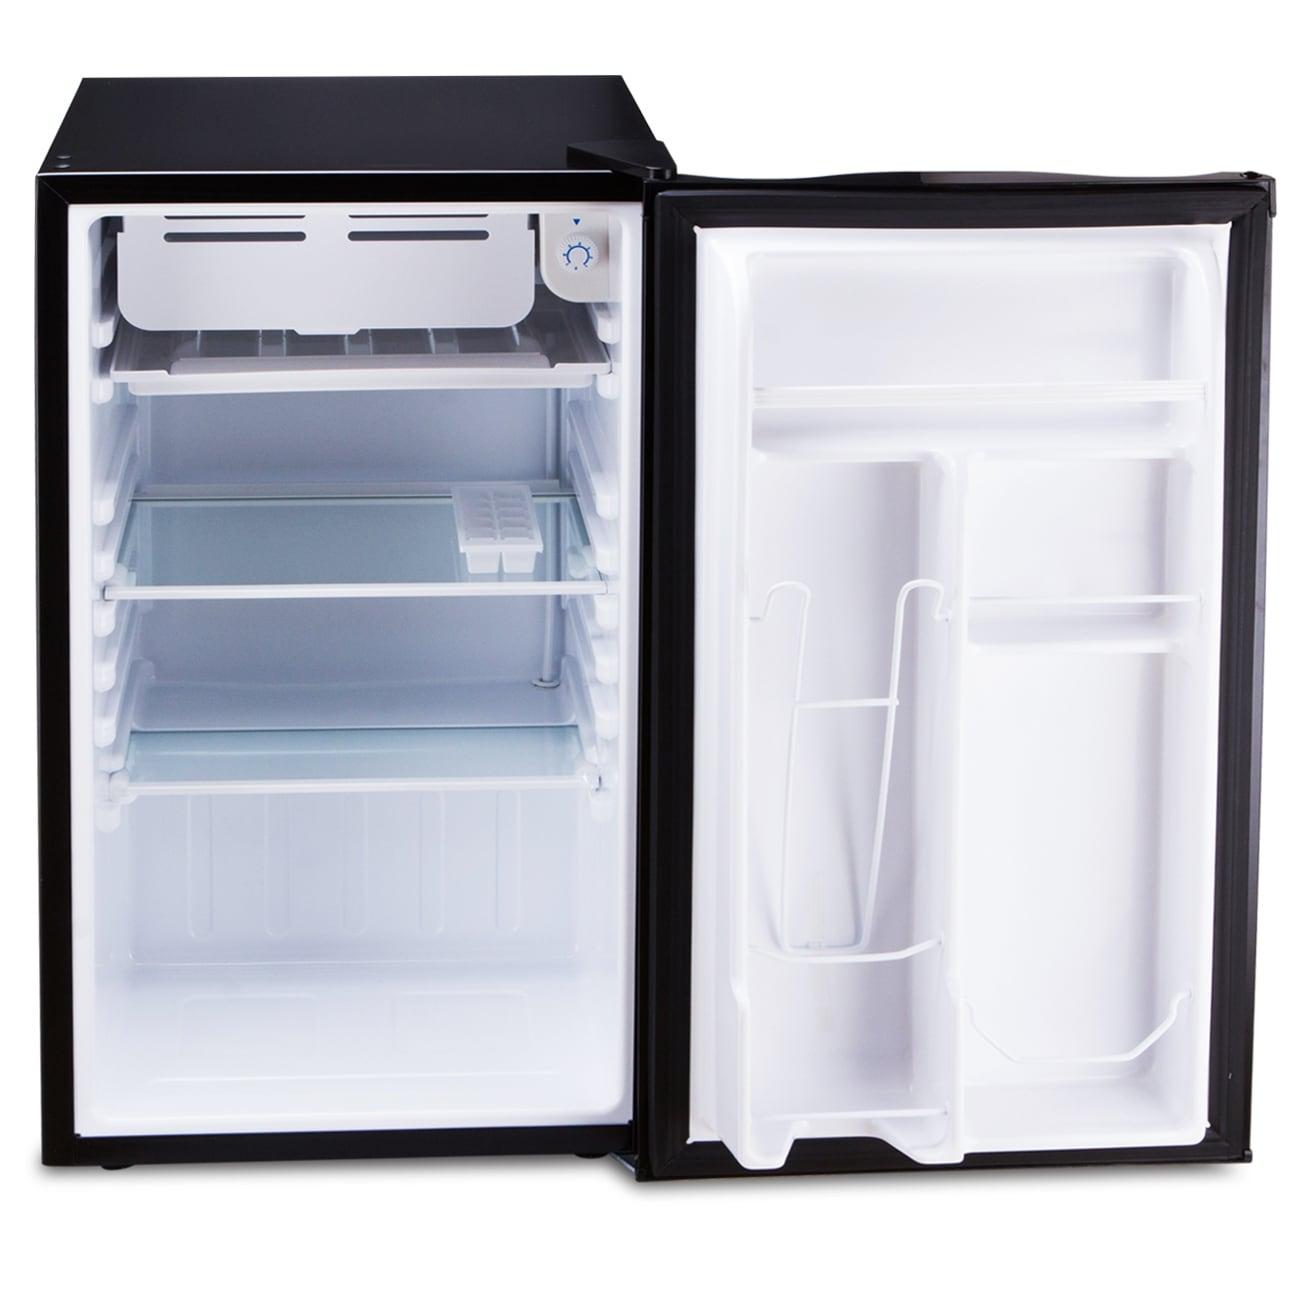 Shop Della Compact Refrigerator Freezer Energy Saving 3 2 Cubic Feet Black Standard Overstock 15874367